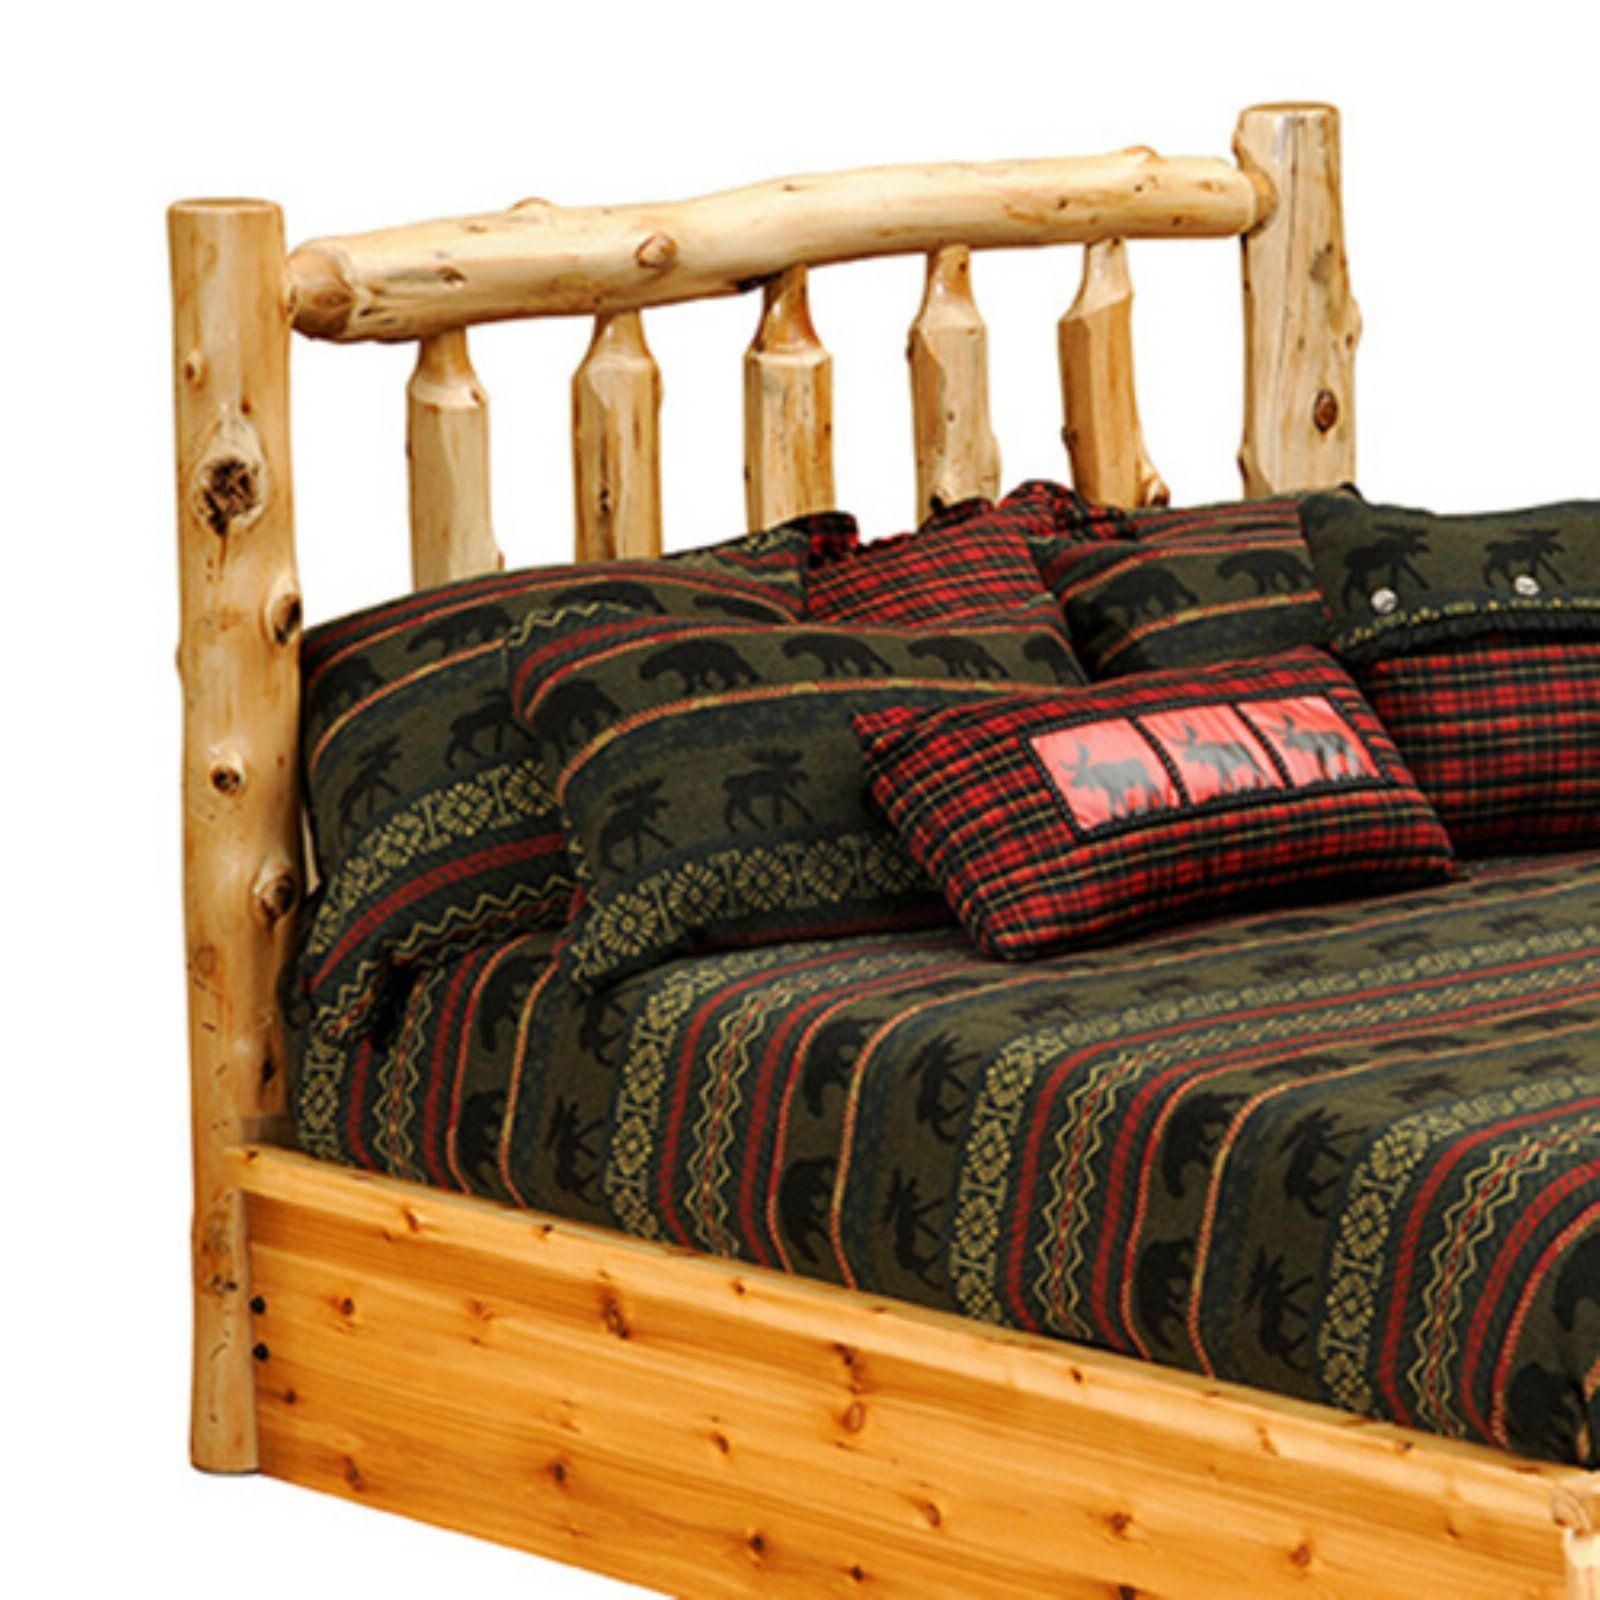 Fireside Lodge Cedar Log Bed, Size California King